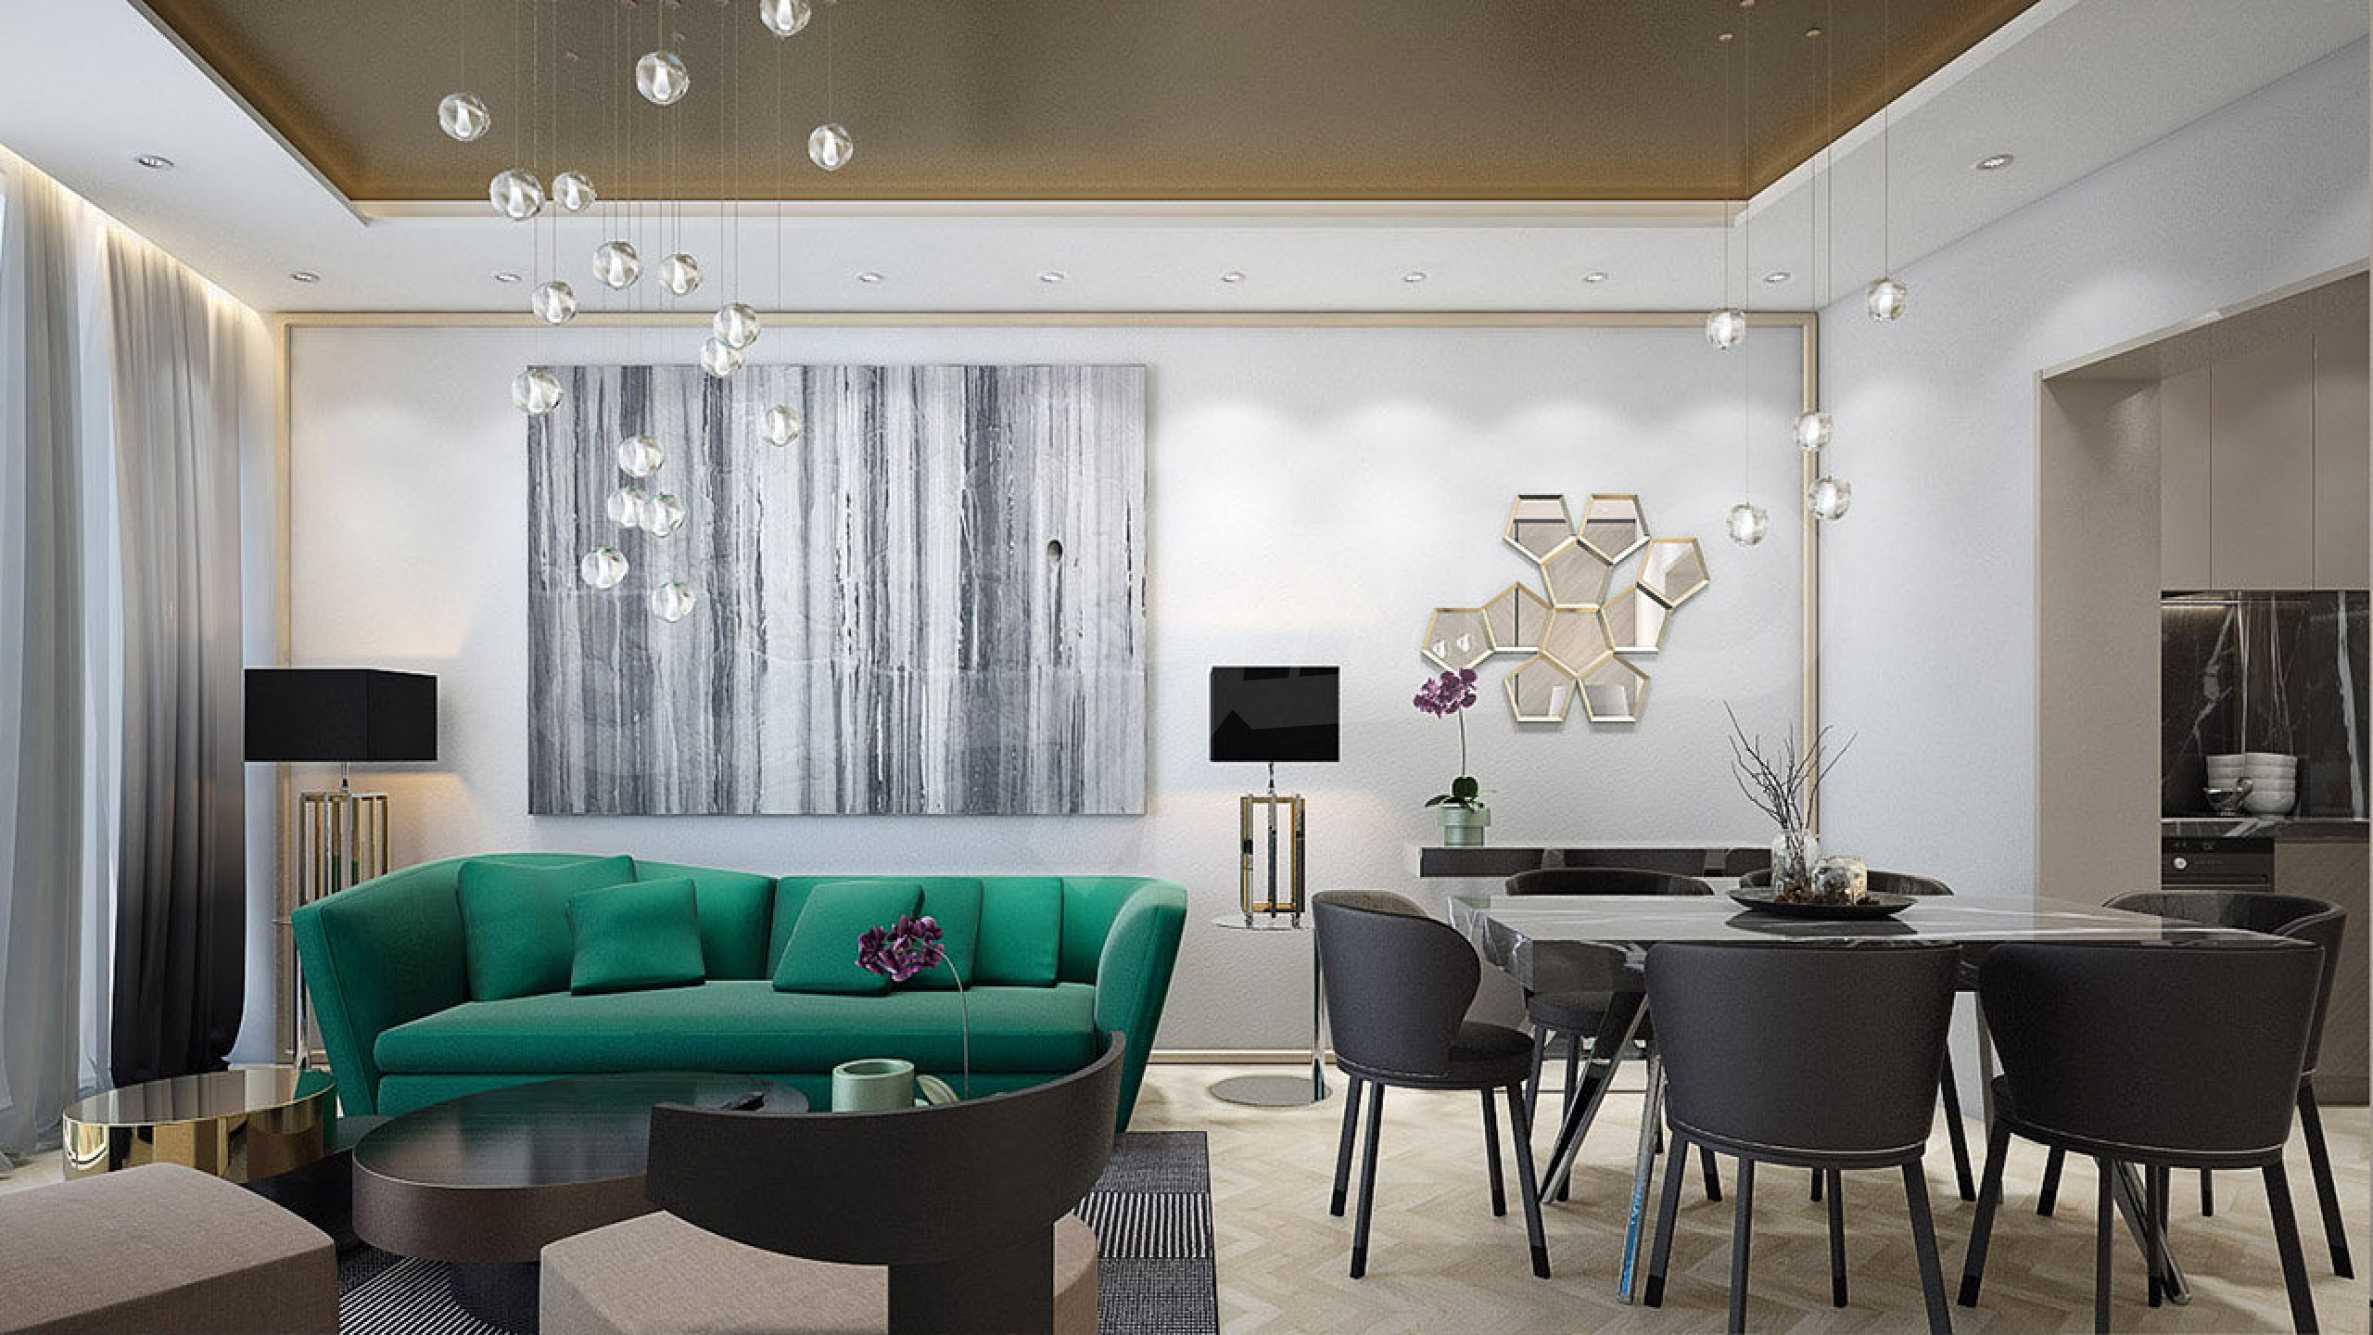 Нова сграда с луксозни апартаменти в гр. Бургас 48